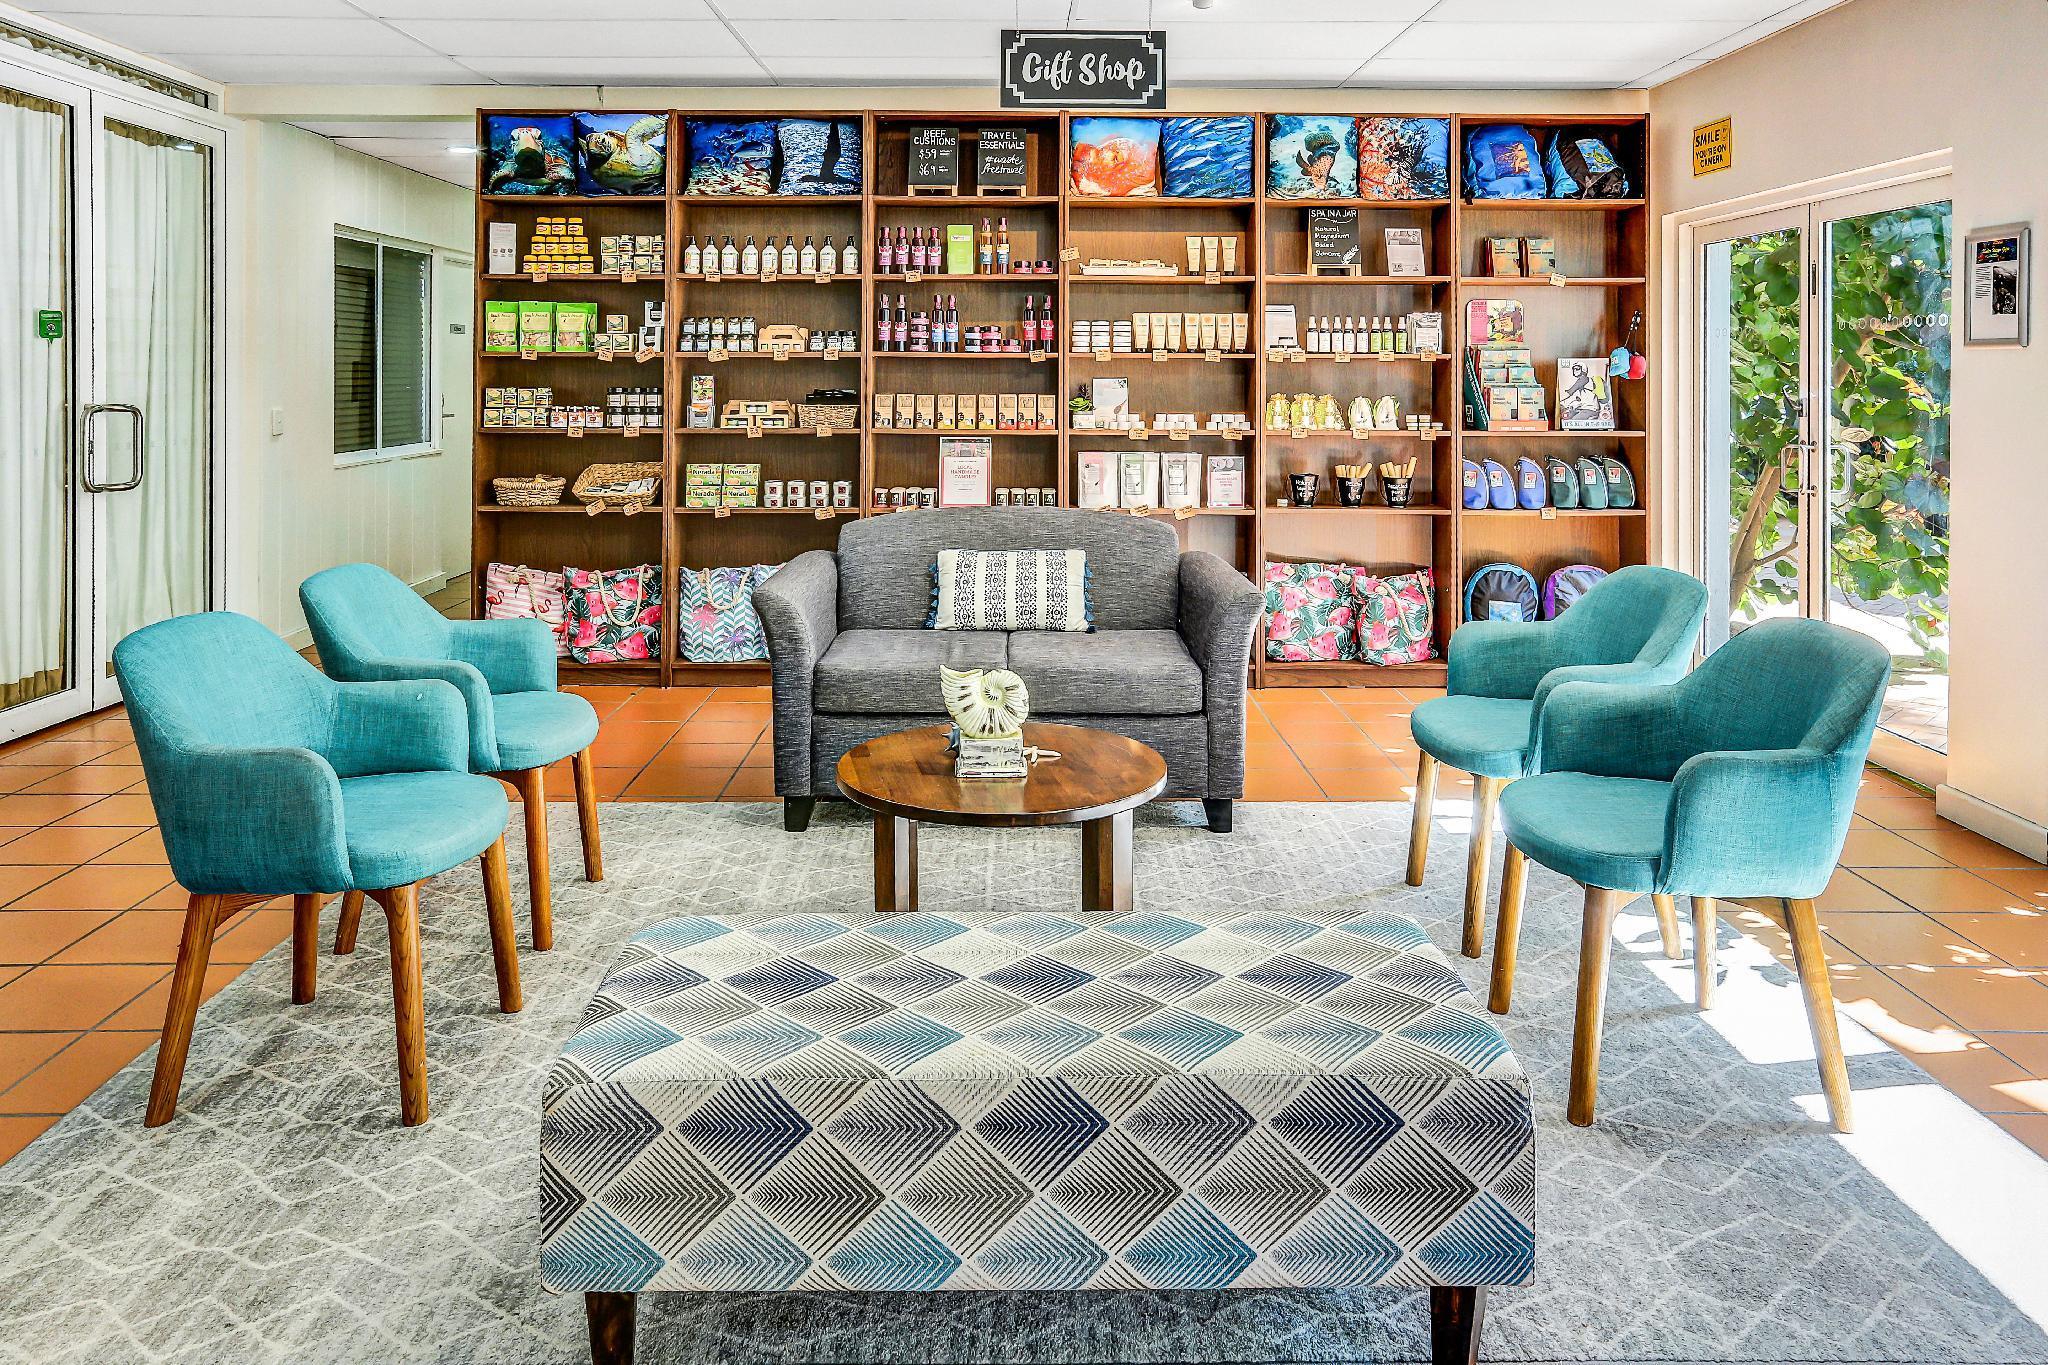 Coral Tree Inn Hotel